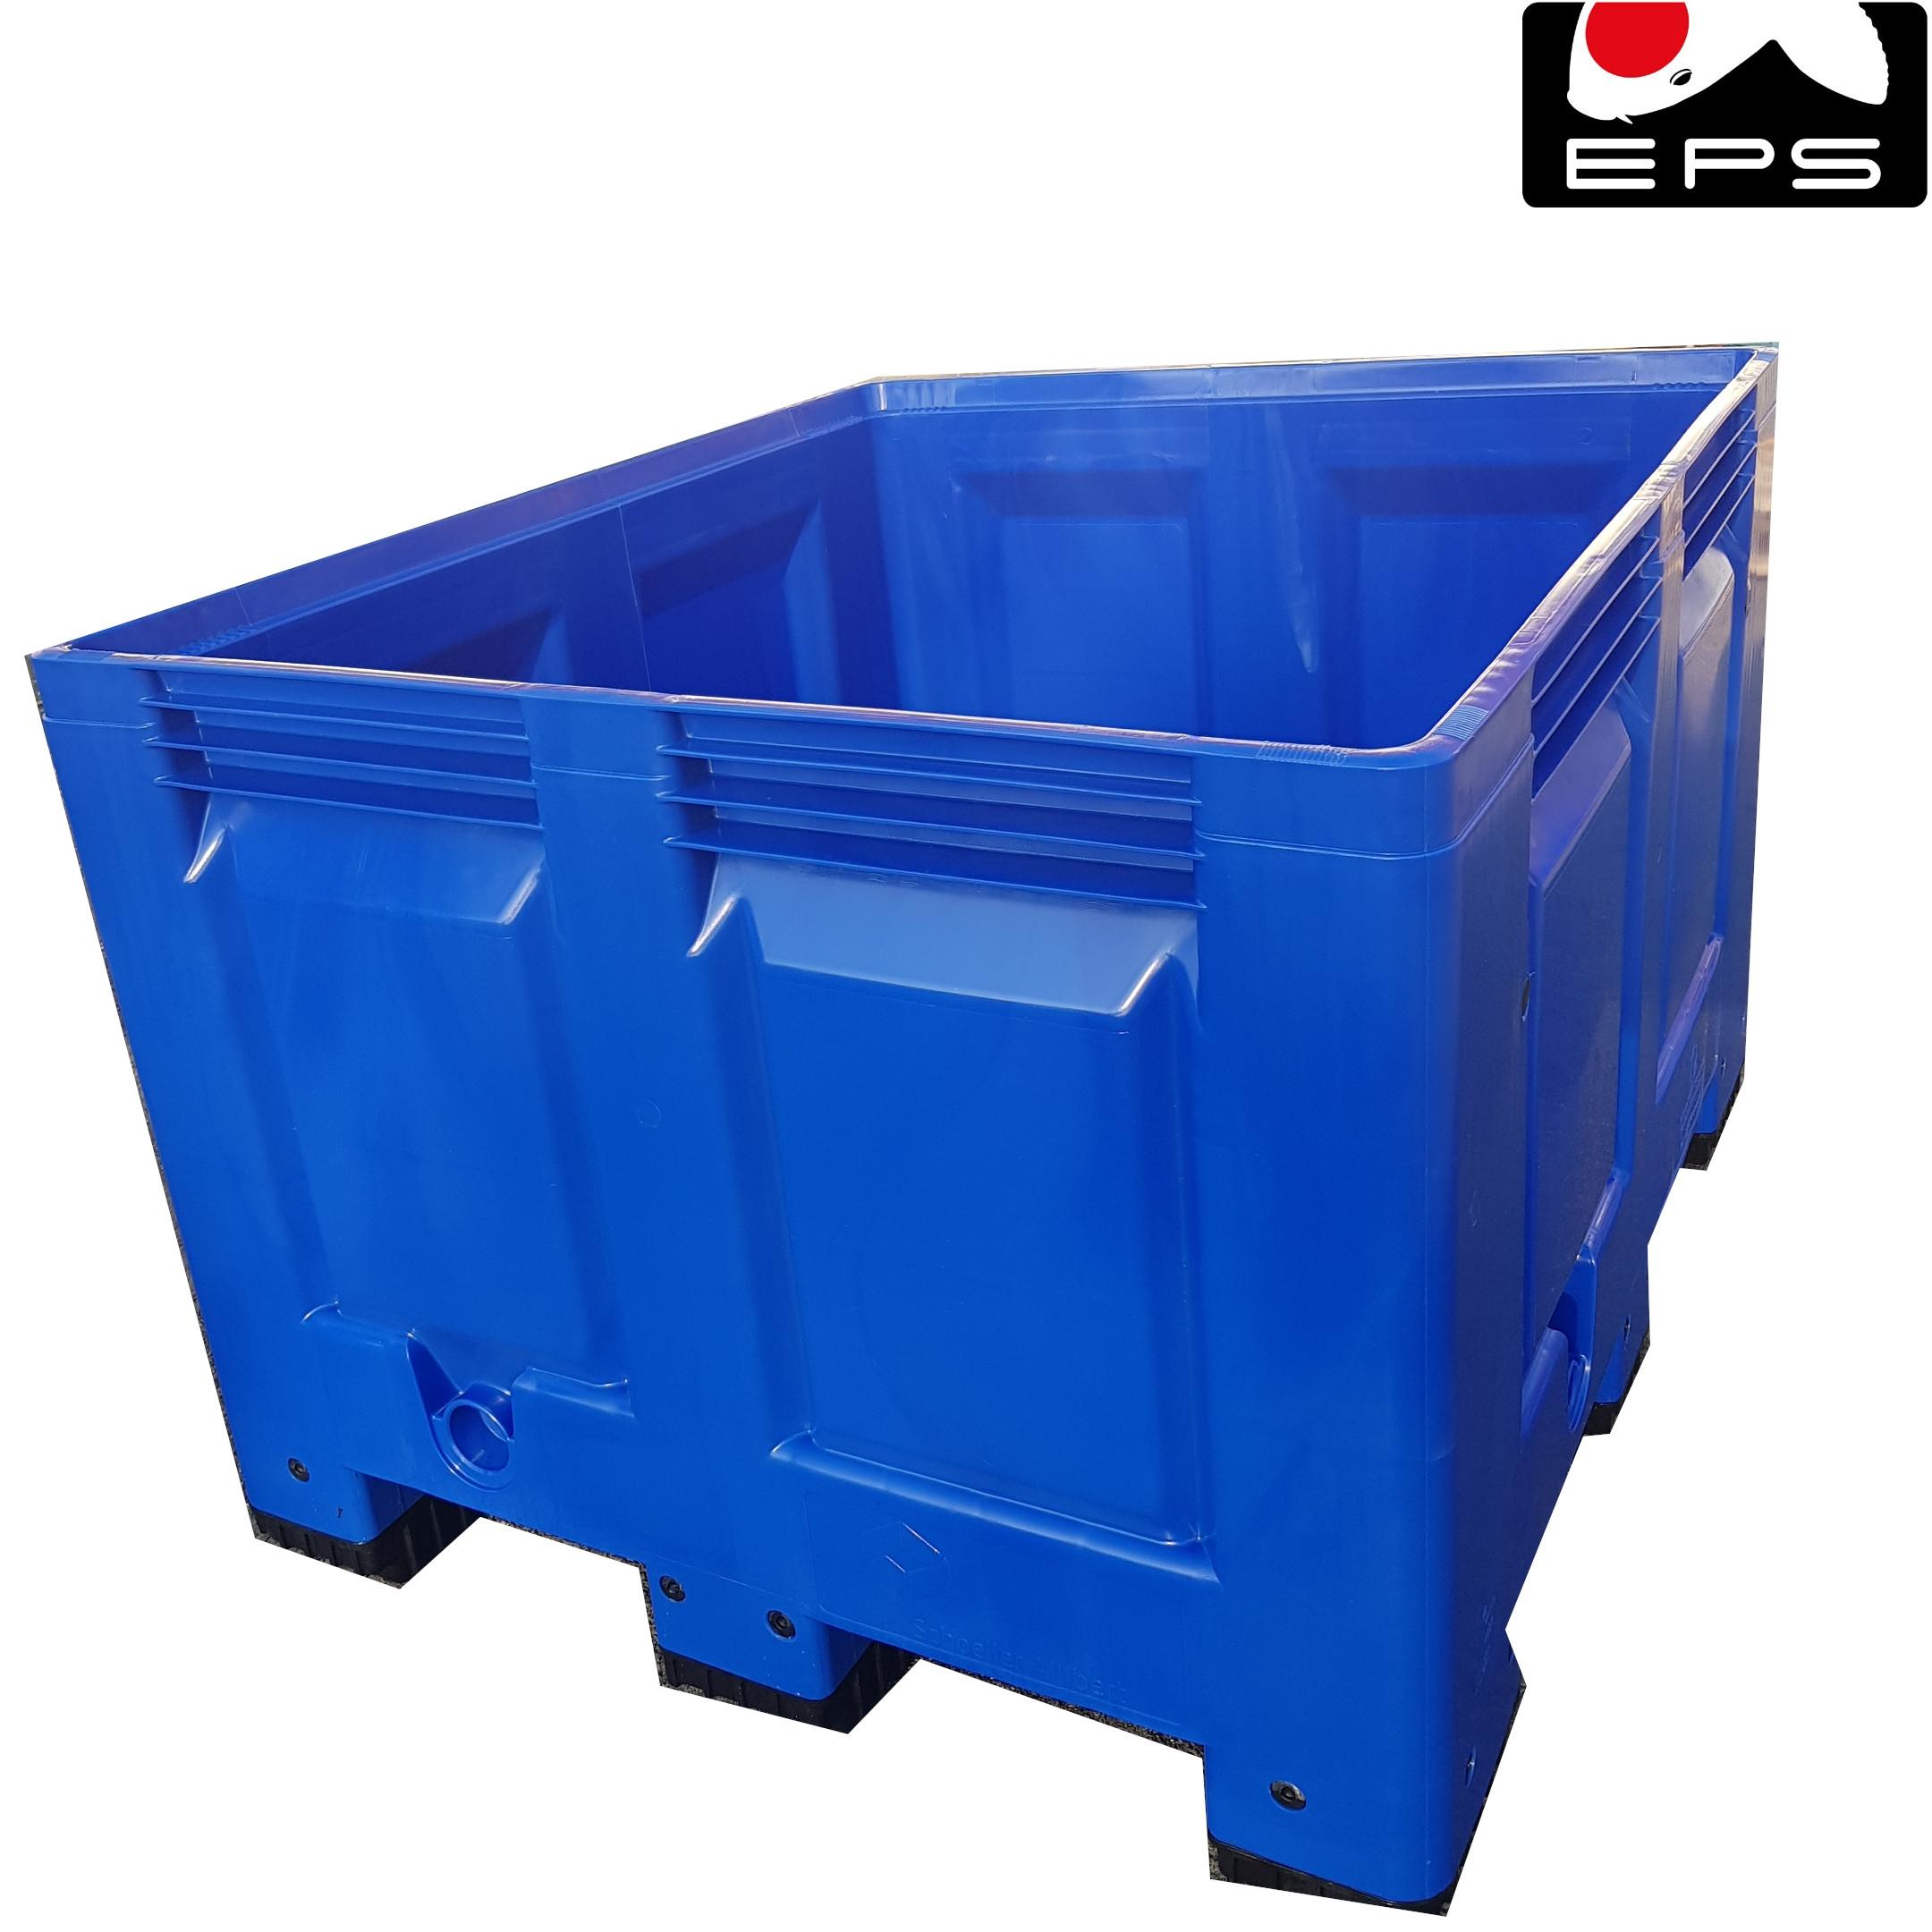 Hälterungsbecken Koibecken Quarantänebecken 610 Liter blau 120x100x80 cm